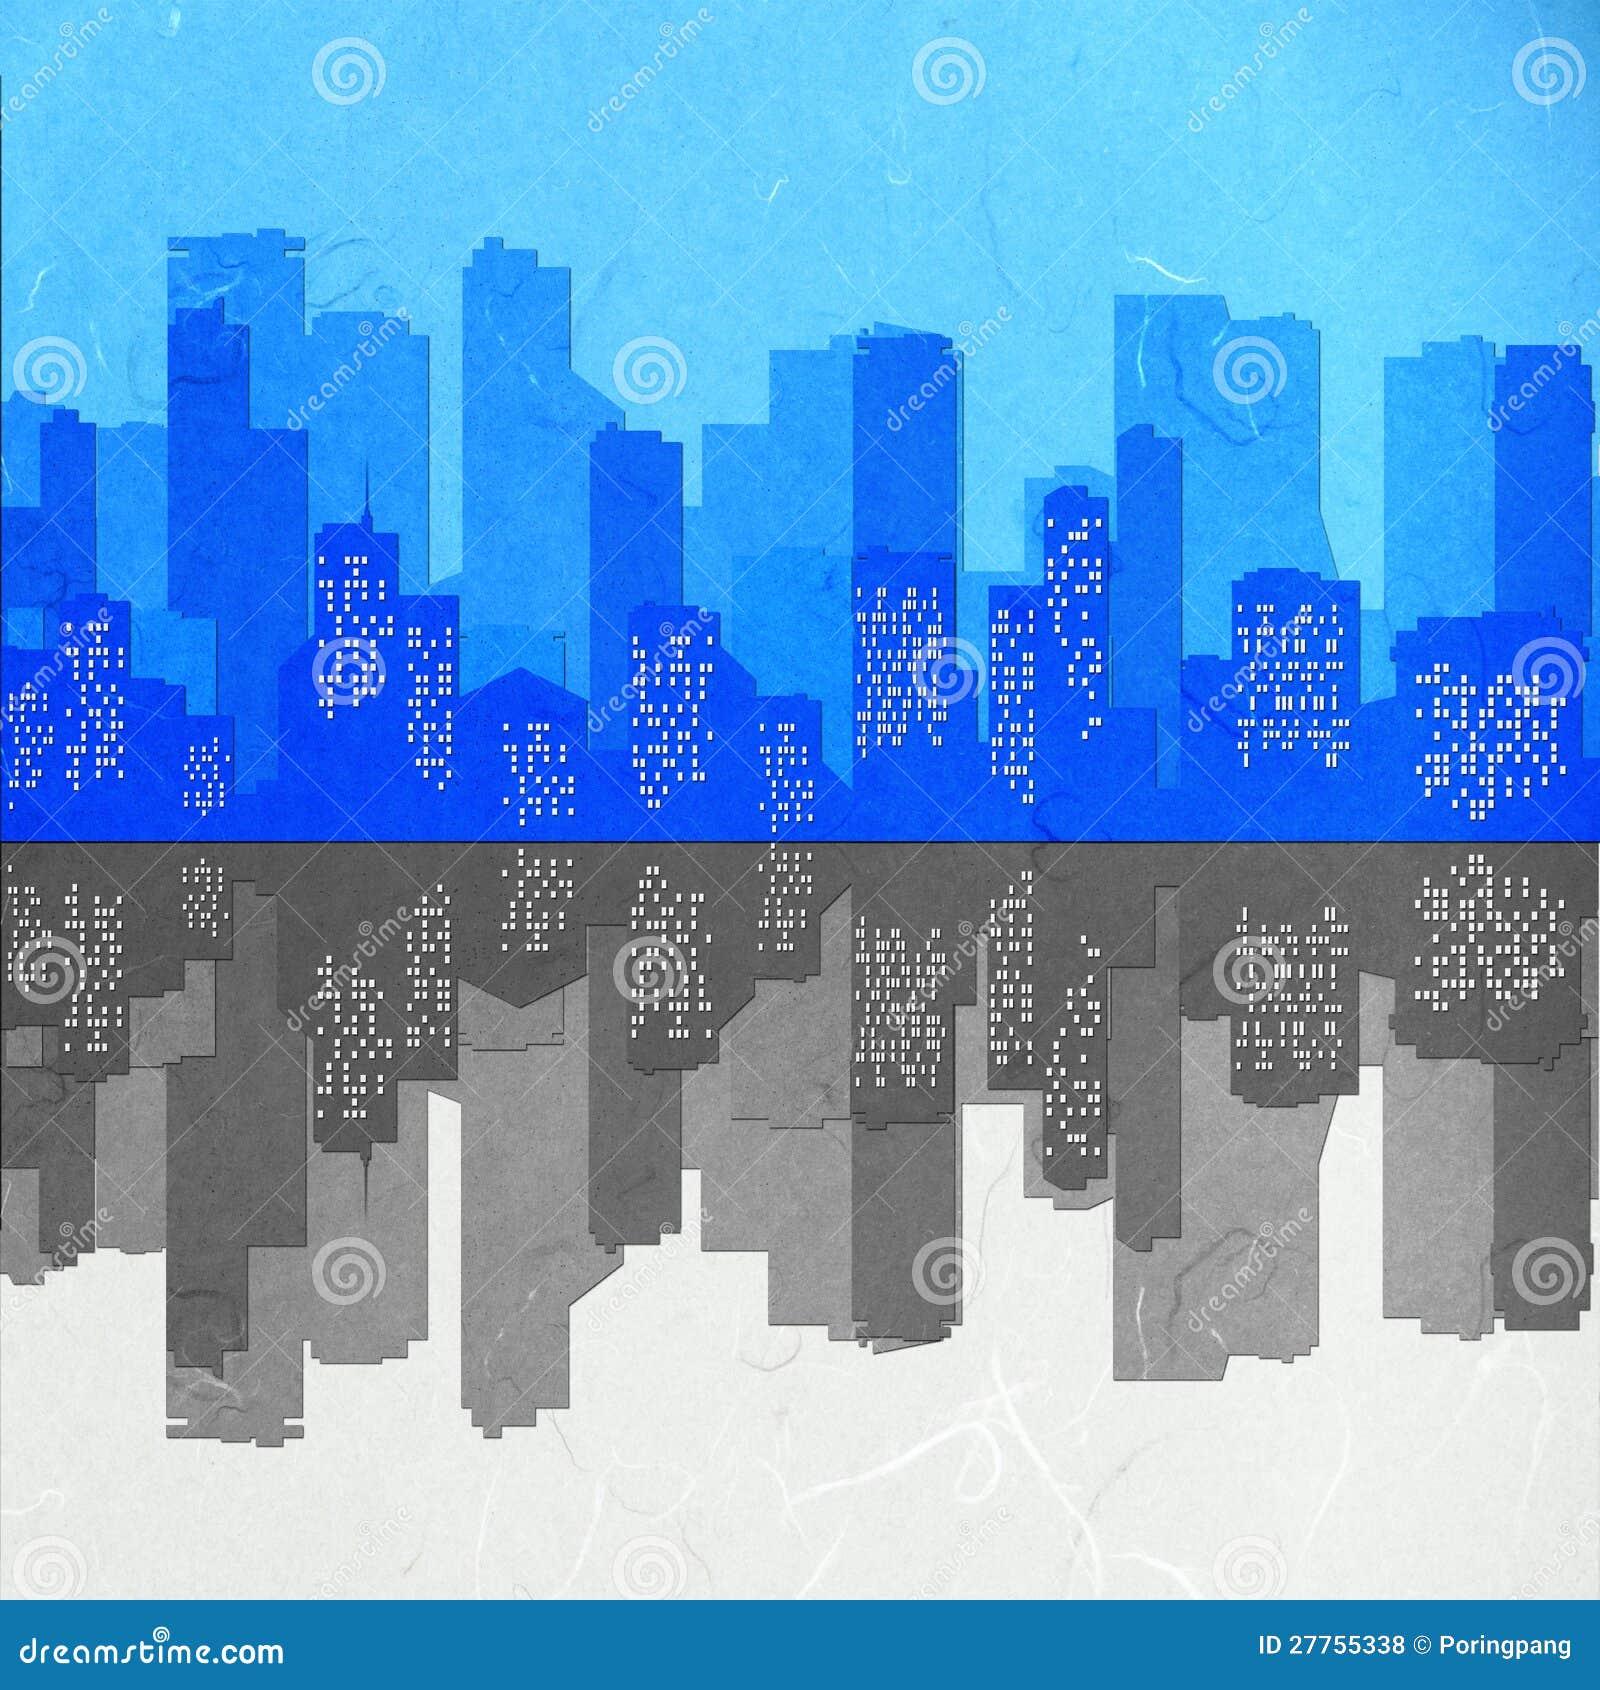 Miroir de paysage urbain de coupure de papier de riz